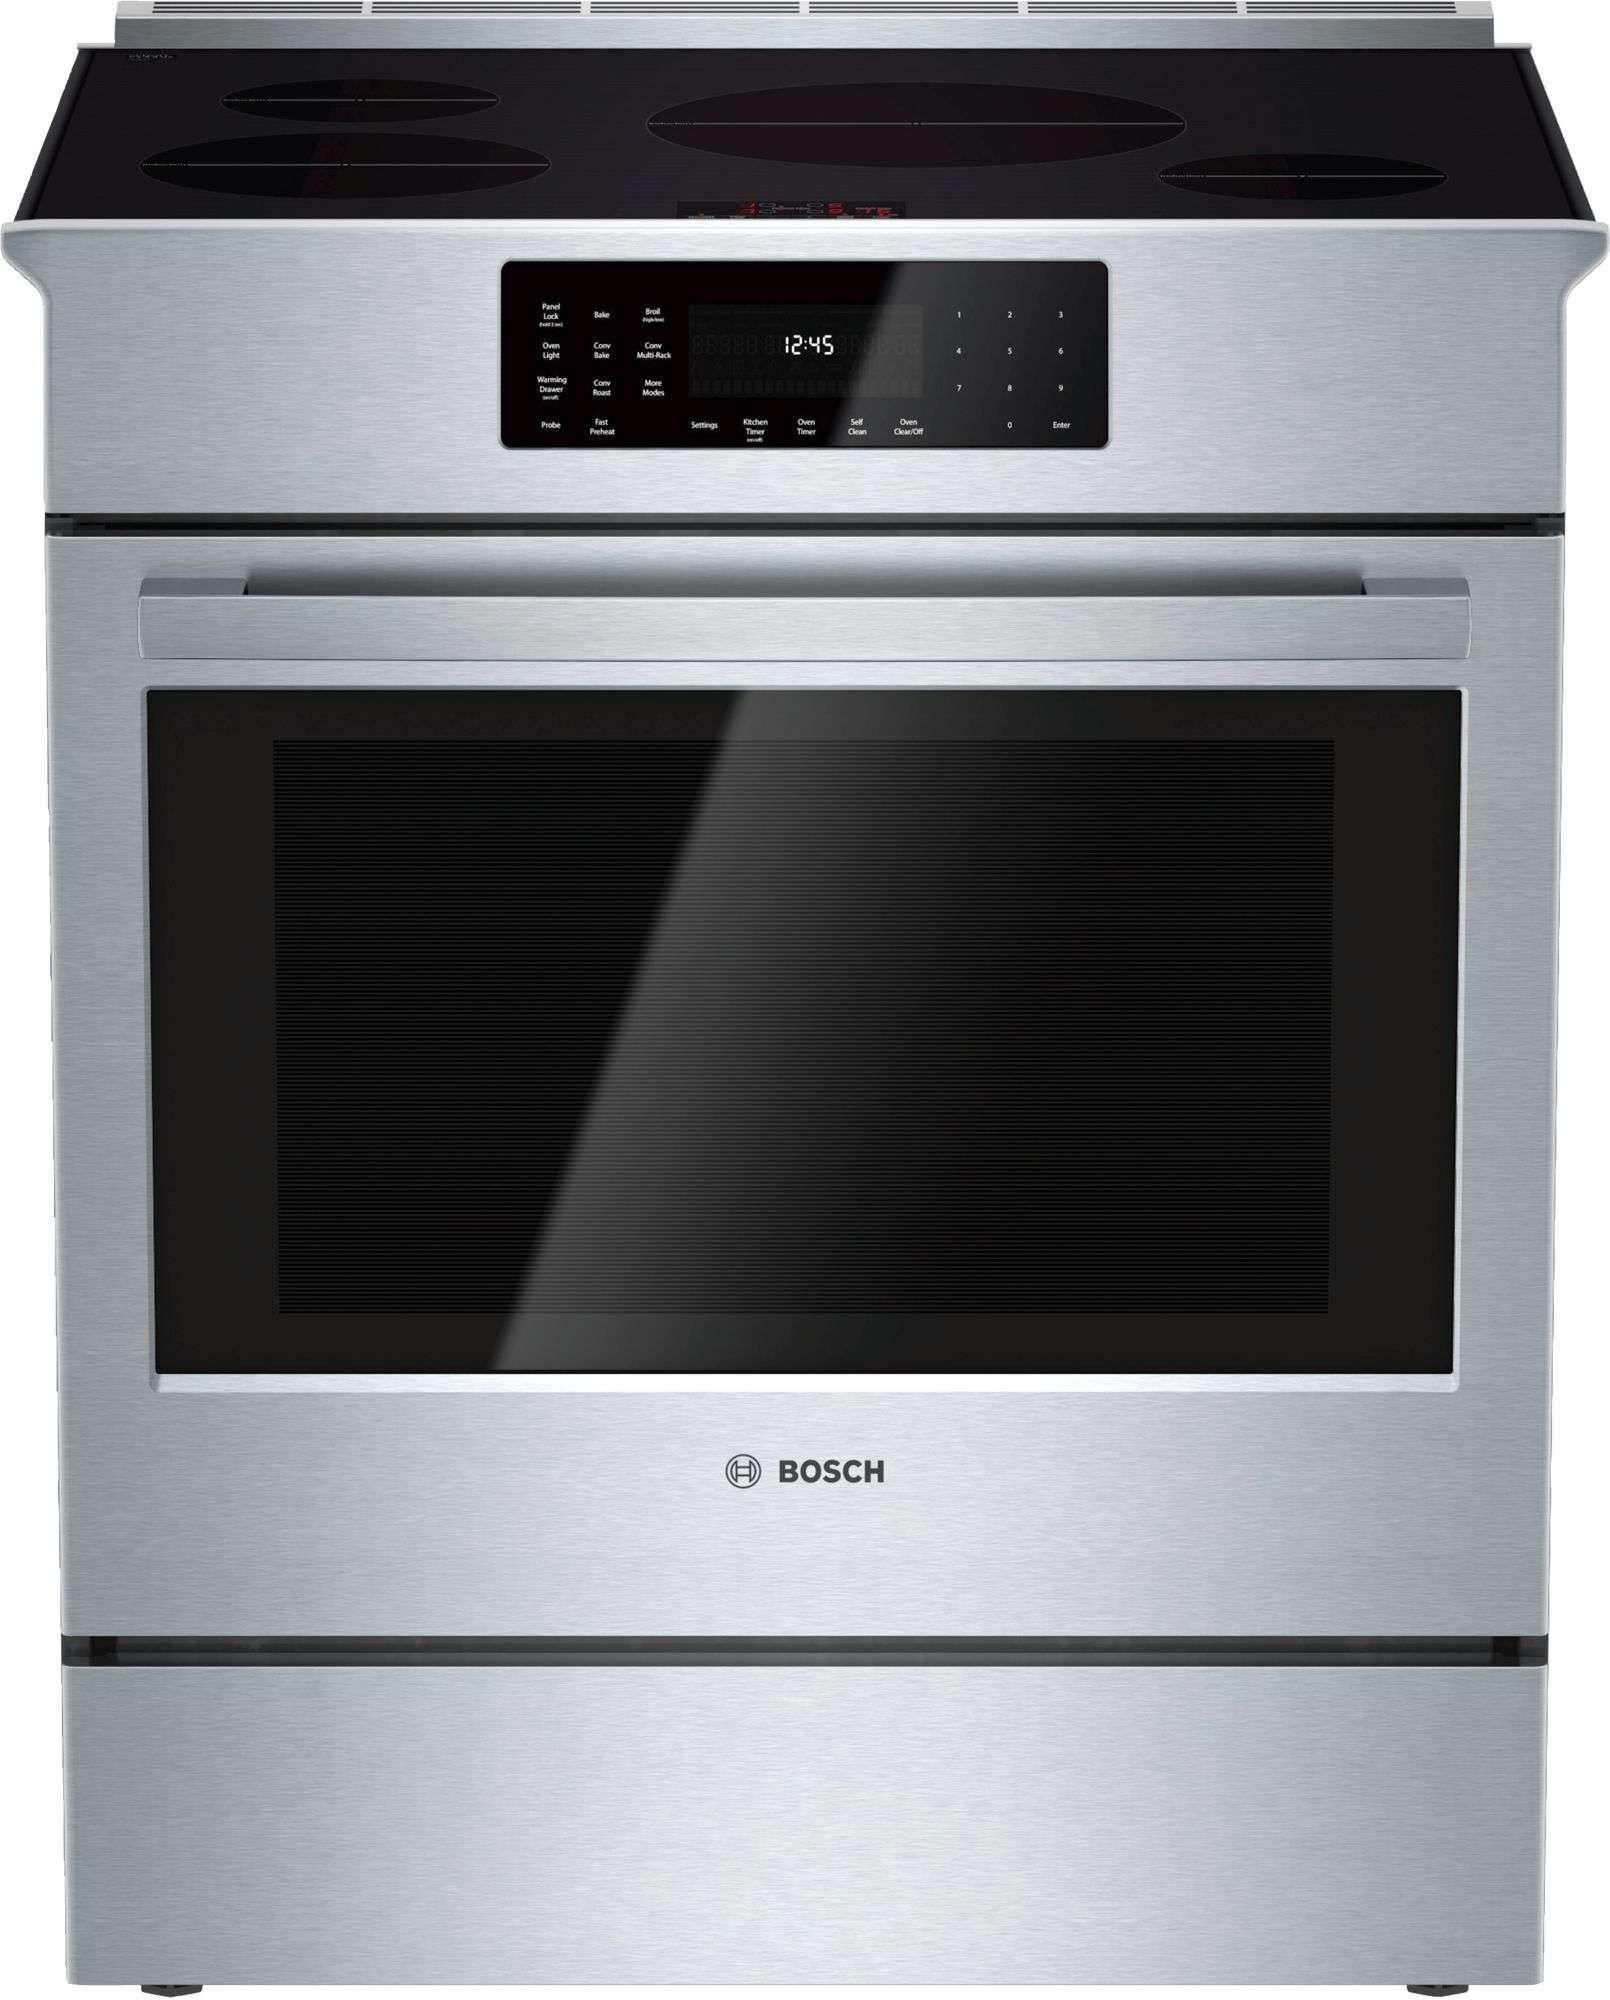 Bosch hii8055u slide in range range cooker